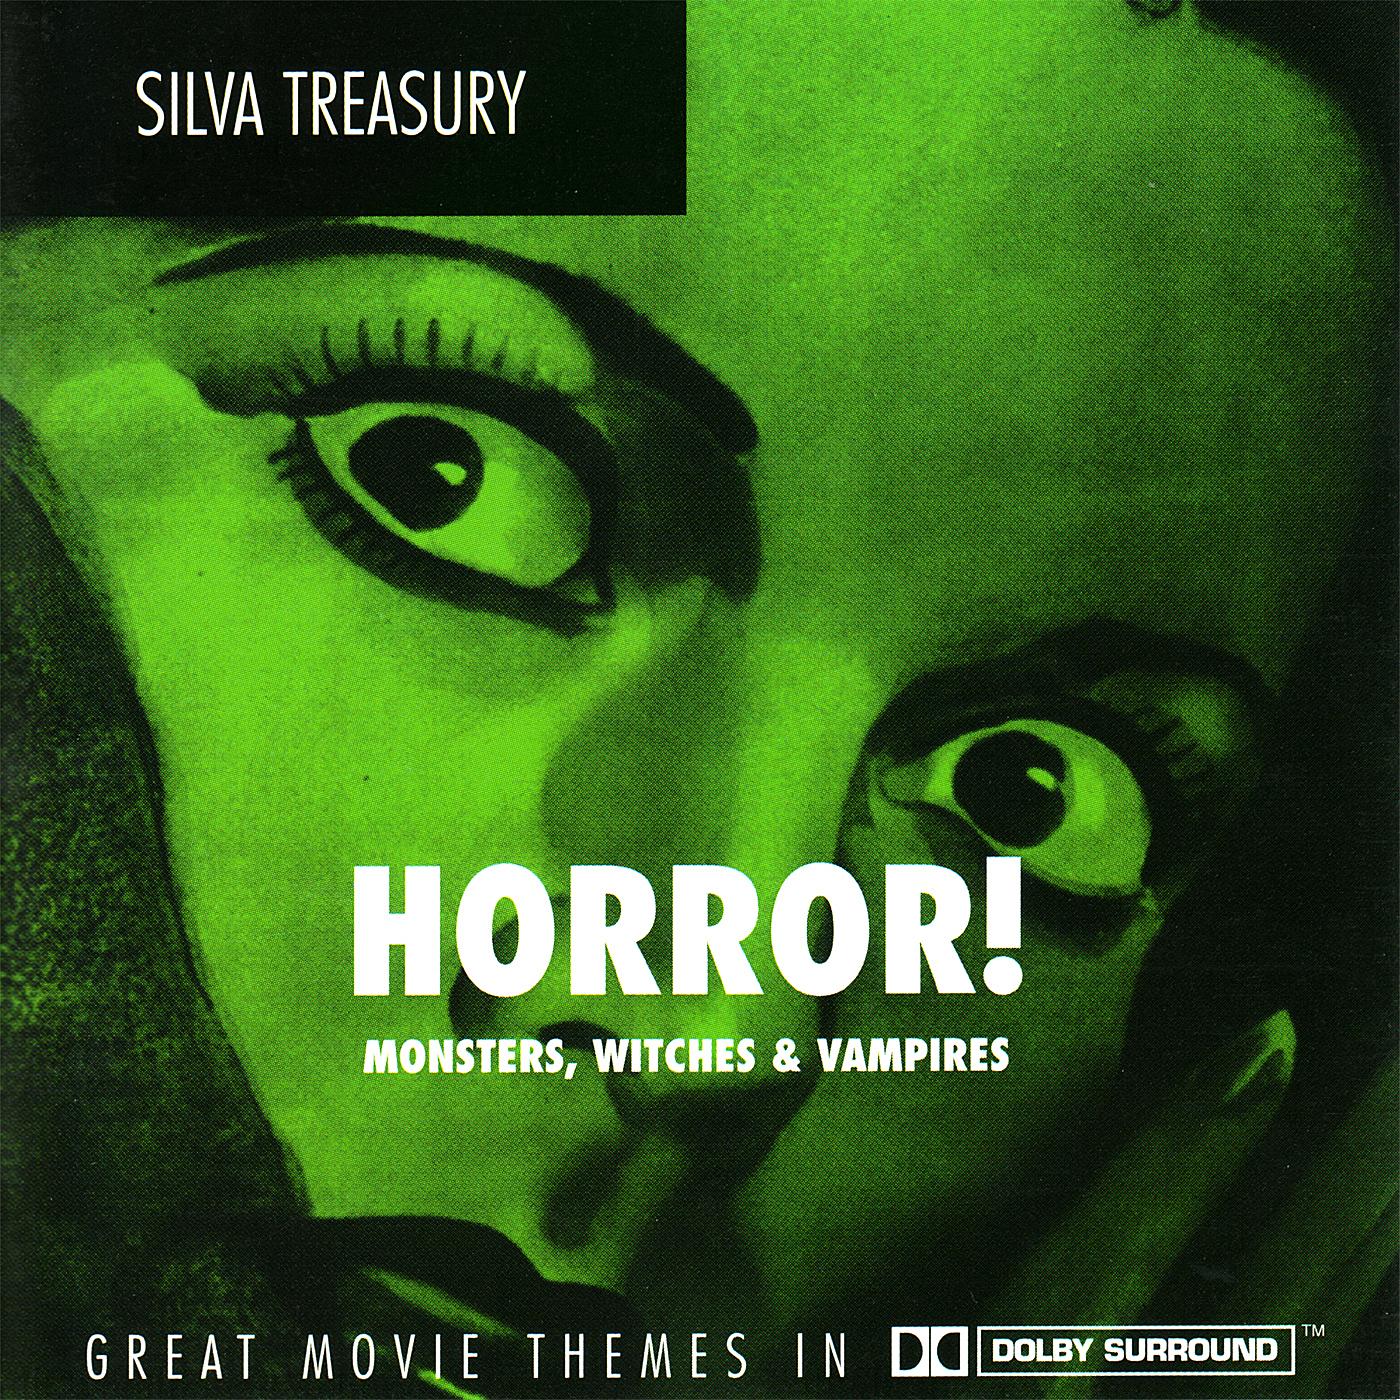 Silva Scream Presents Classic Horror Themes